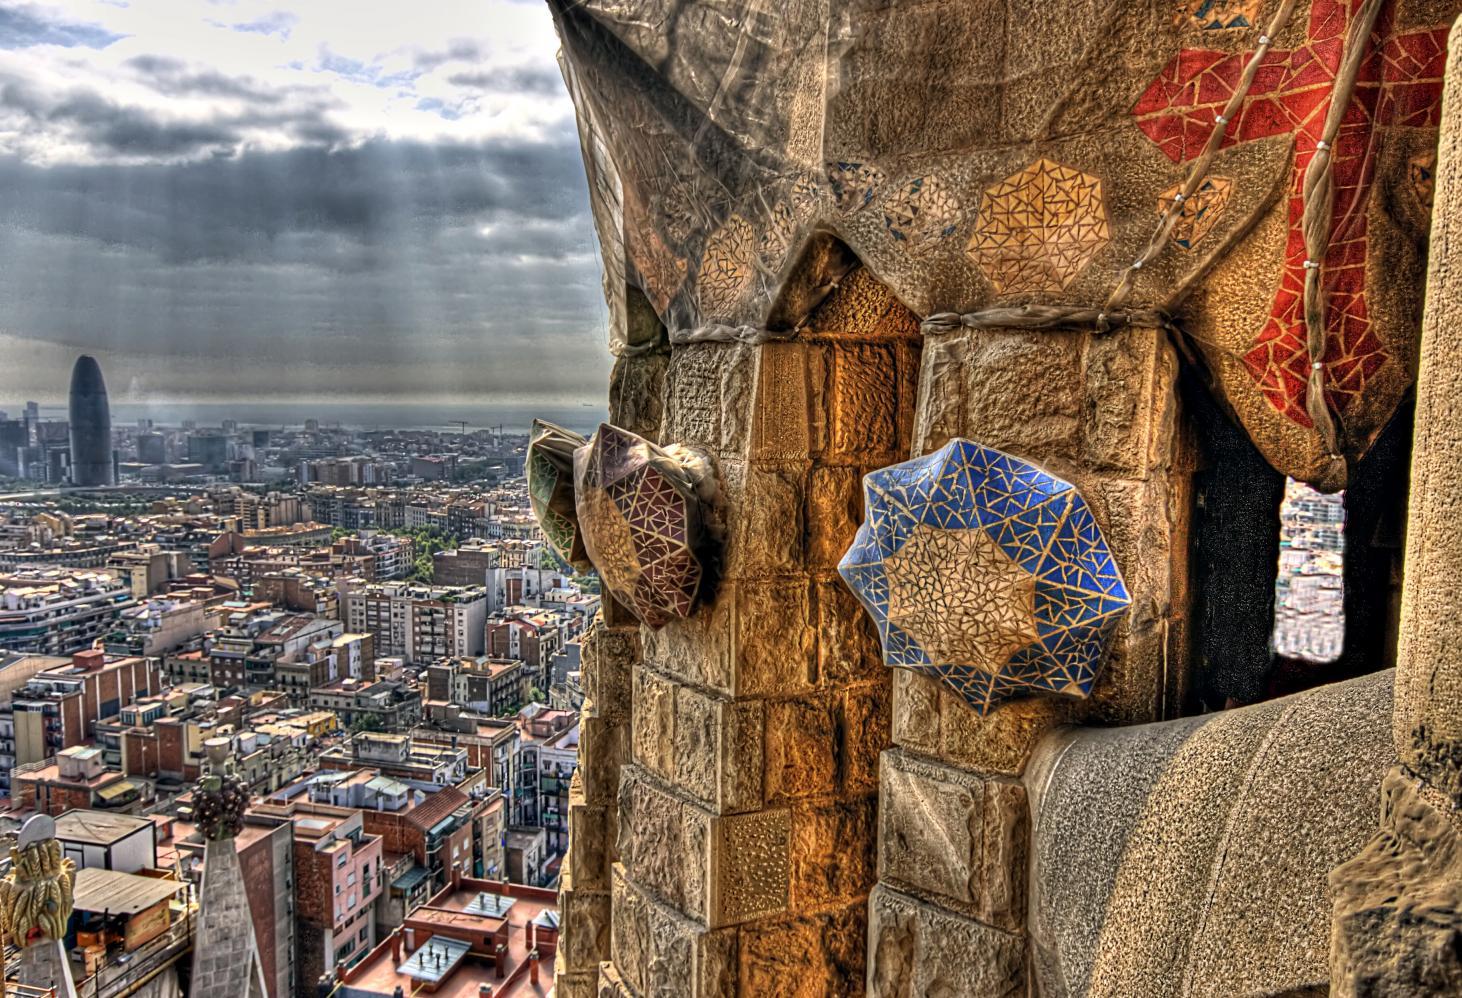 Храм Святого Семейства (Temple Expiatori de la Sagrada Família)